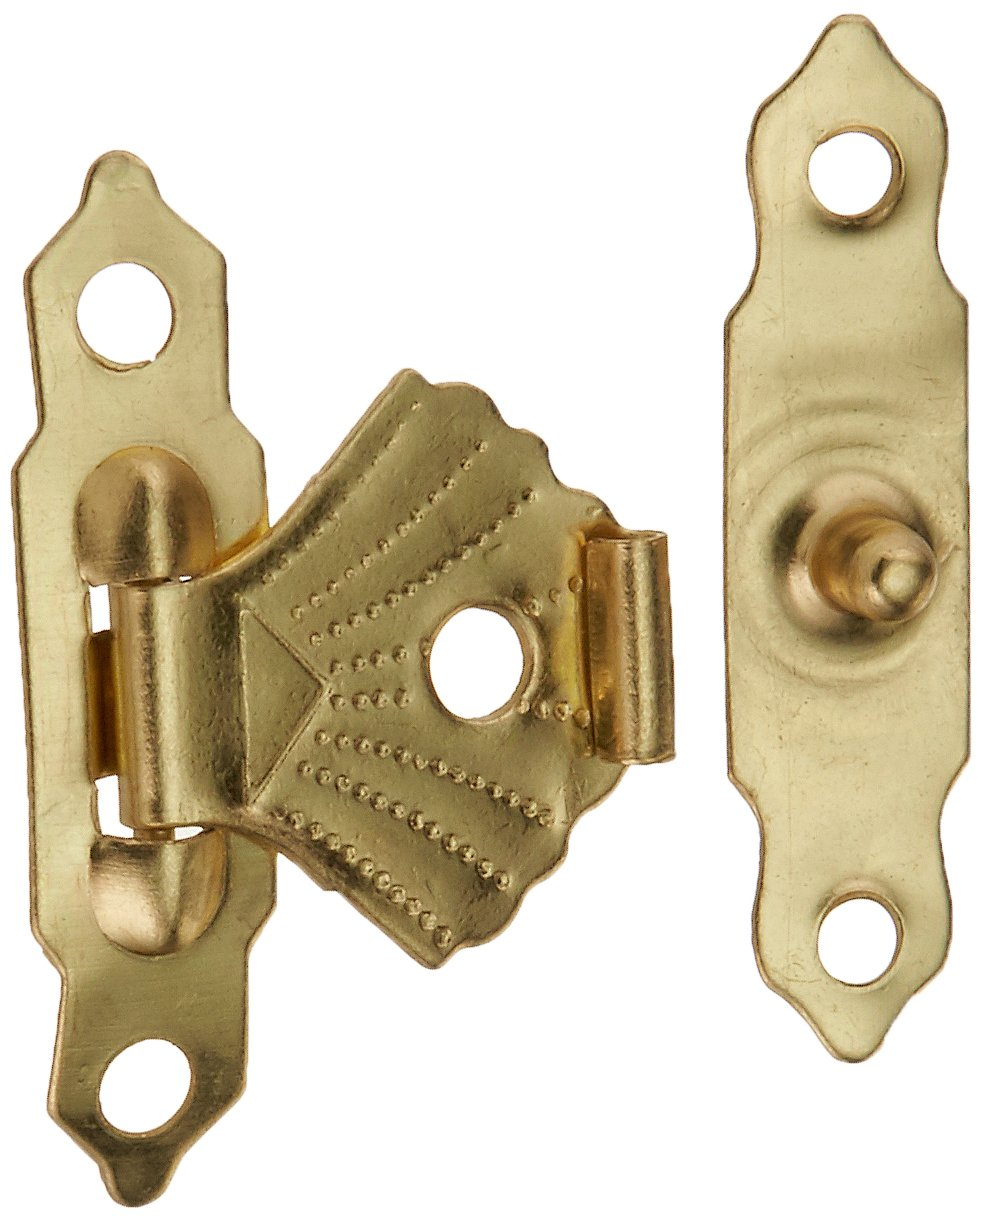 50 pcs Metall Mini Flower Leaf Schmuck Fall Box Lock Haspe Staple Set Sourcingmap a14093000ux0013